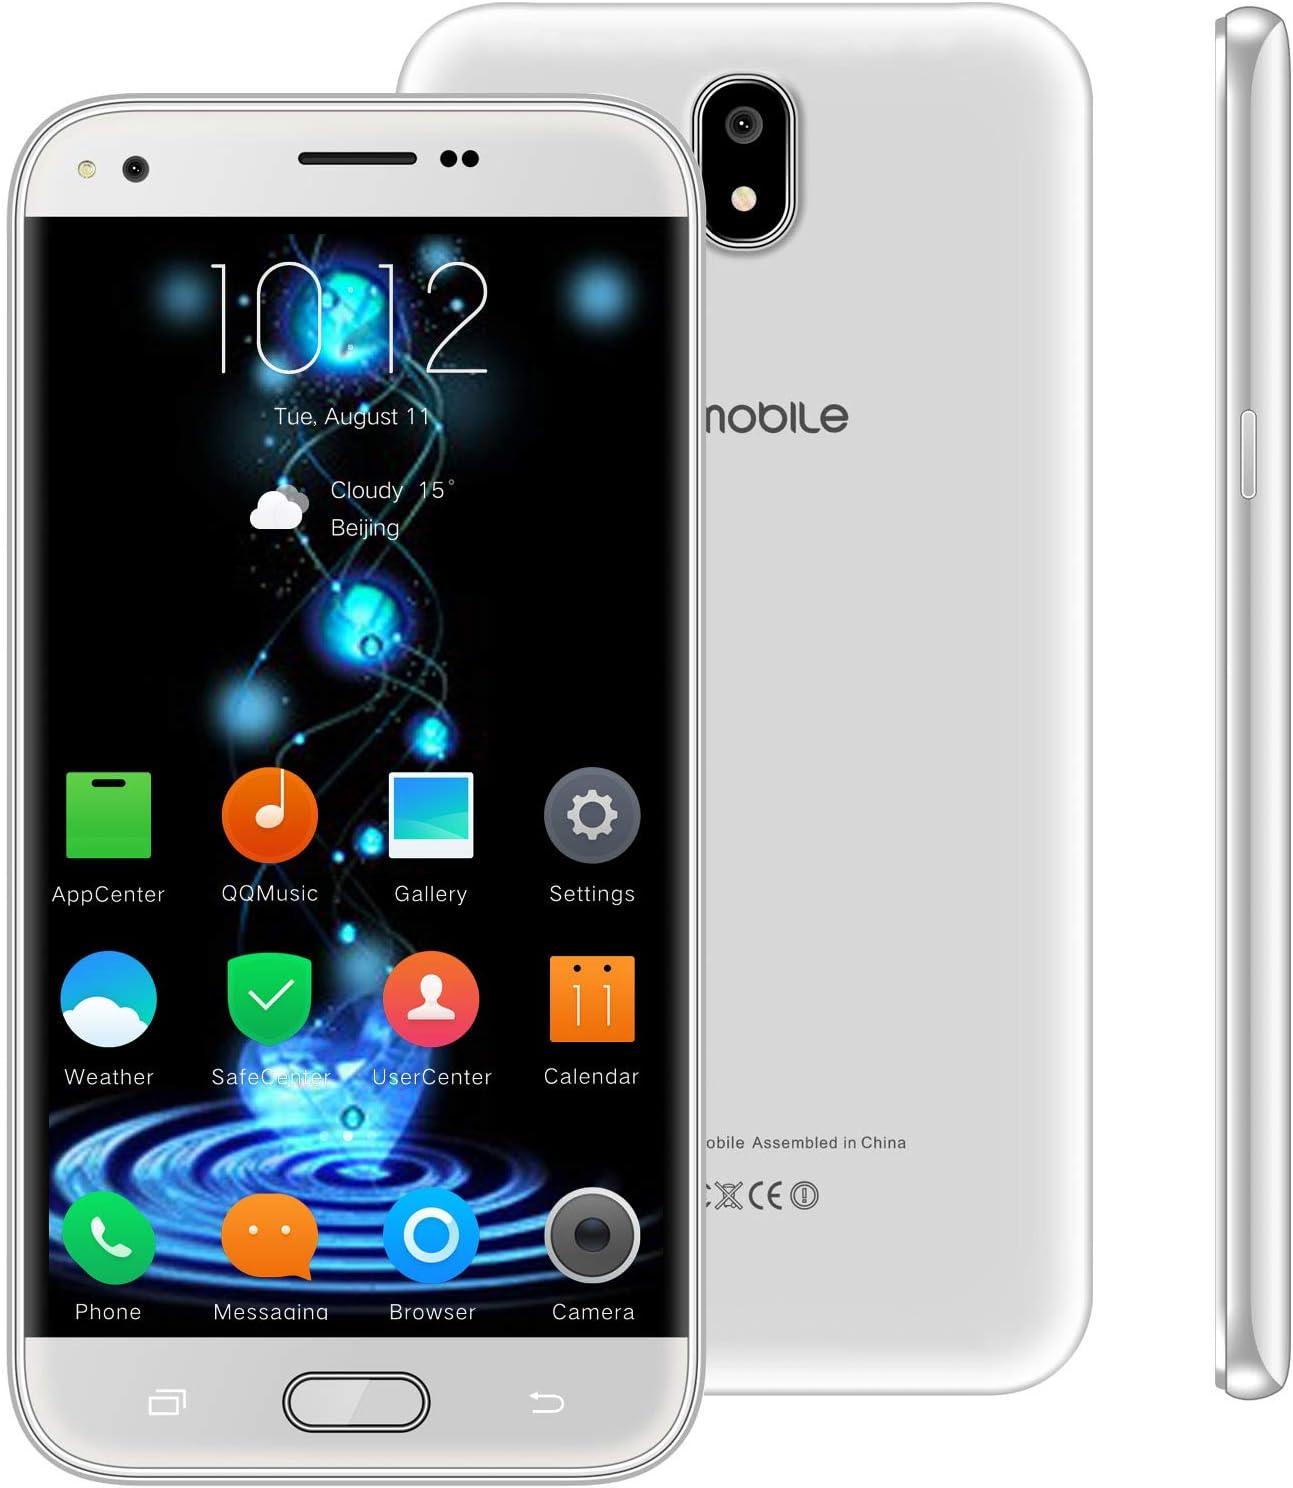 Telefono Movil Libres Baratos 4g,10Pcs V Mobile J5 5.5 Pulgadas 16GB 5MP Cámara Dual Sim Android 7,0 2800mAh Batería Smartphone 1.3GHz Quad Core (Blanco): Amazon.es: Electrónica